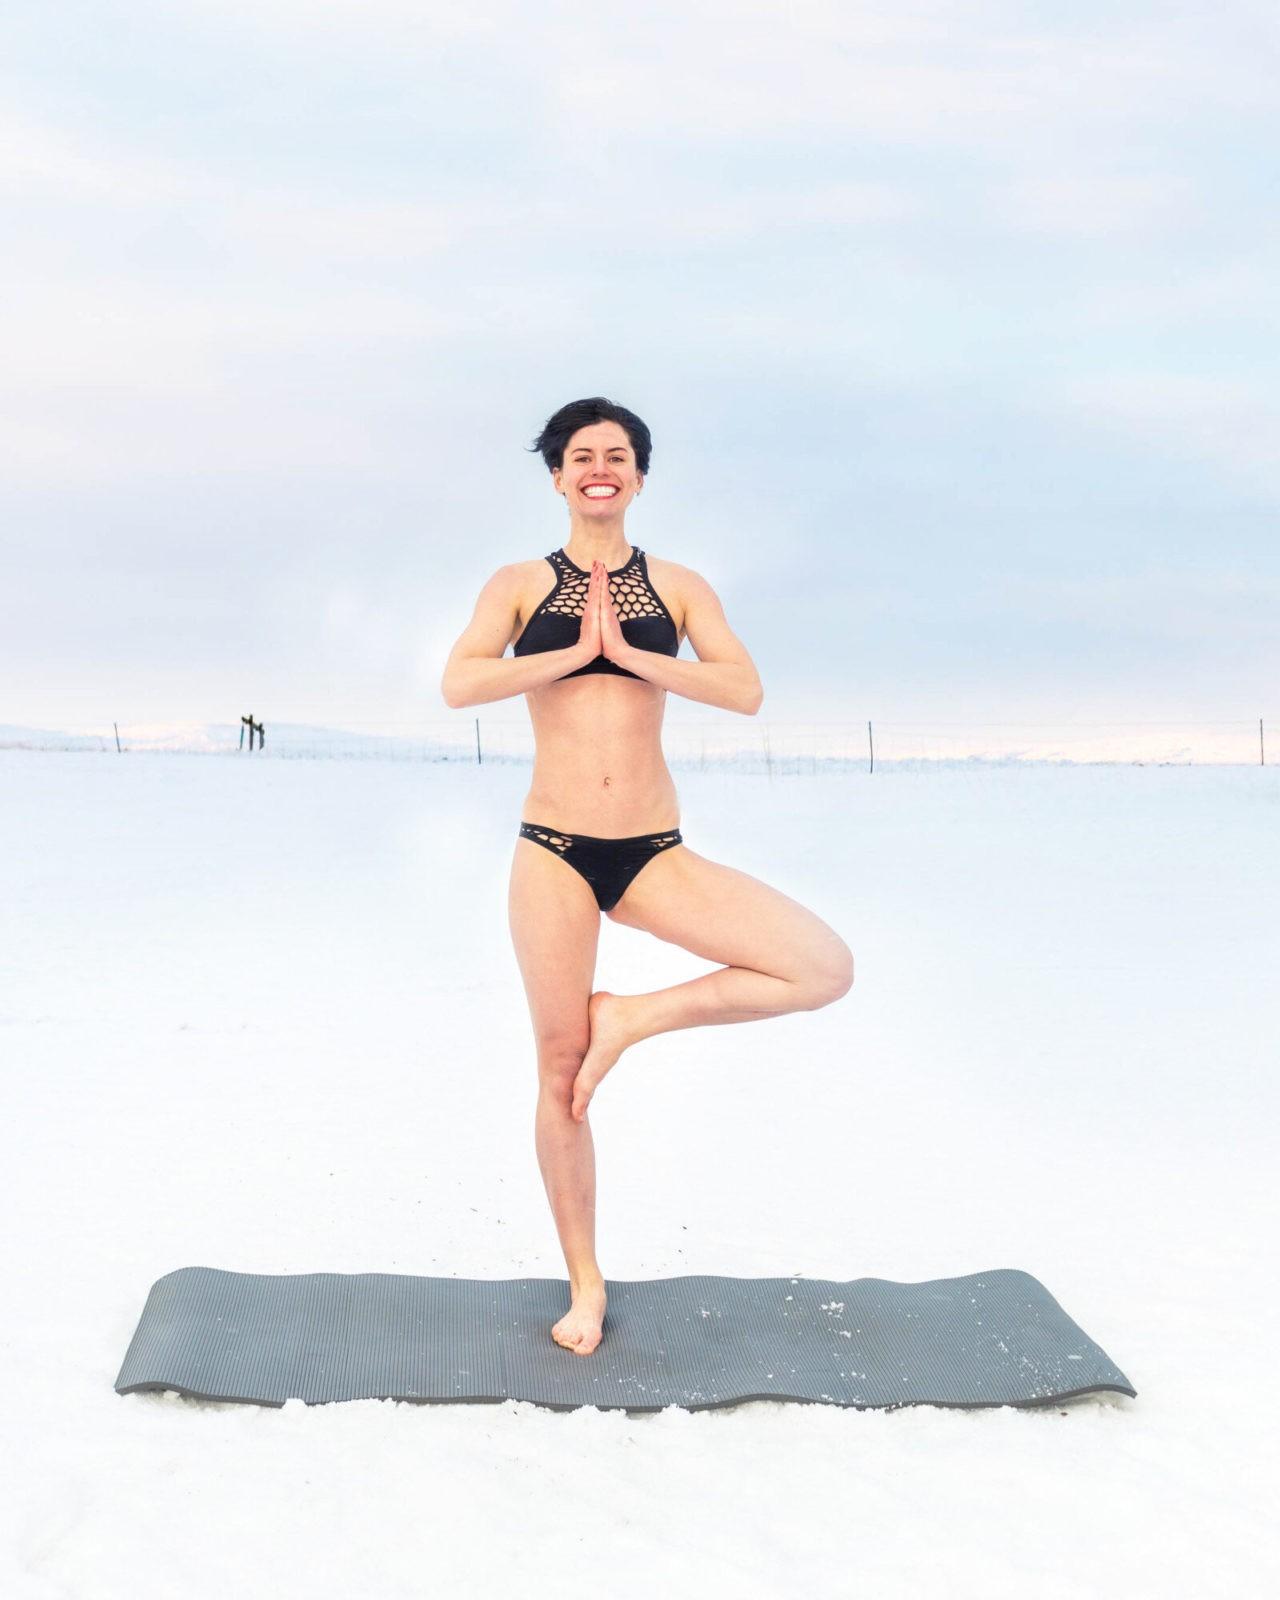 Do yoga to keep warm.